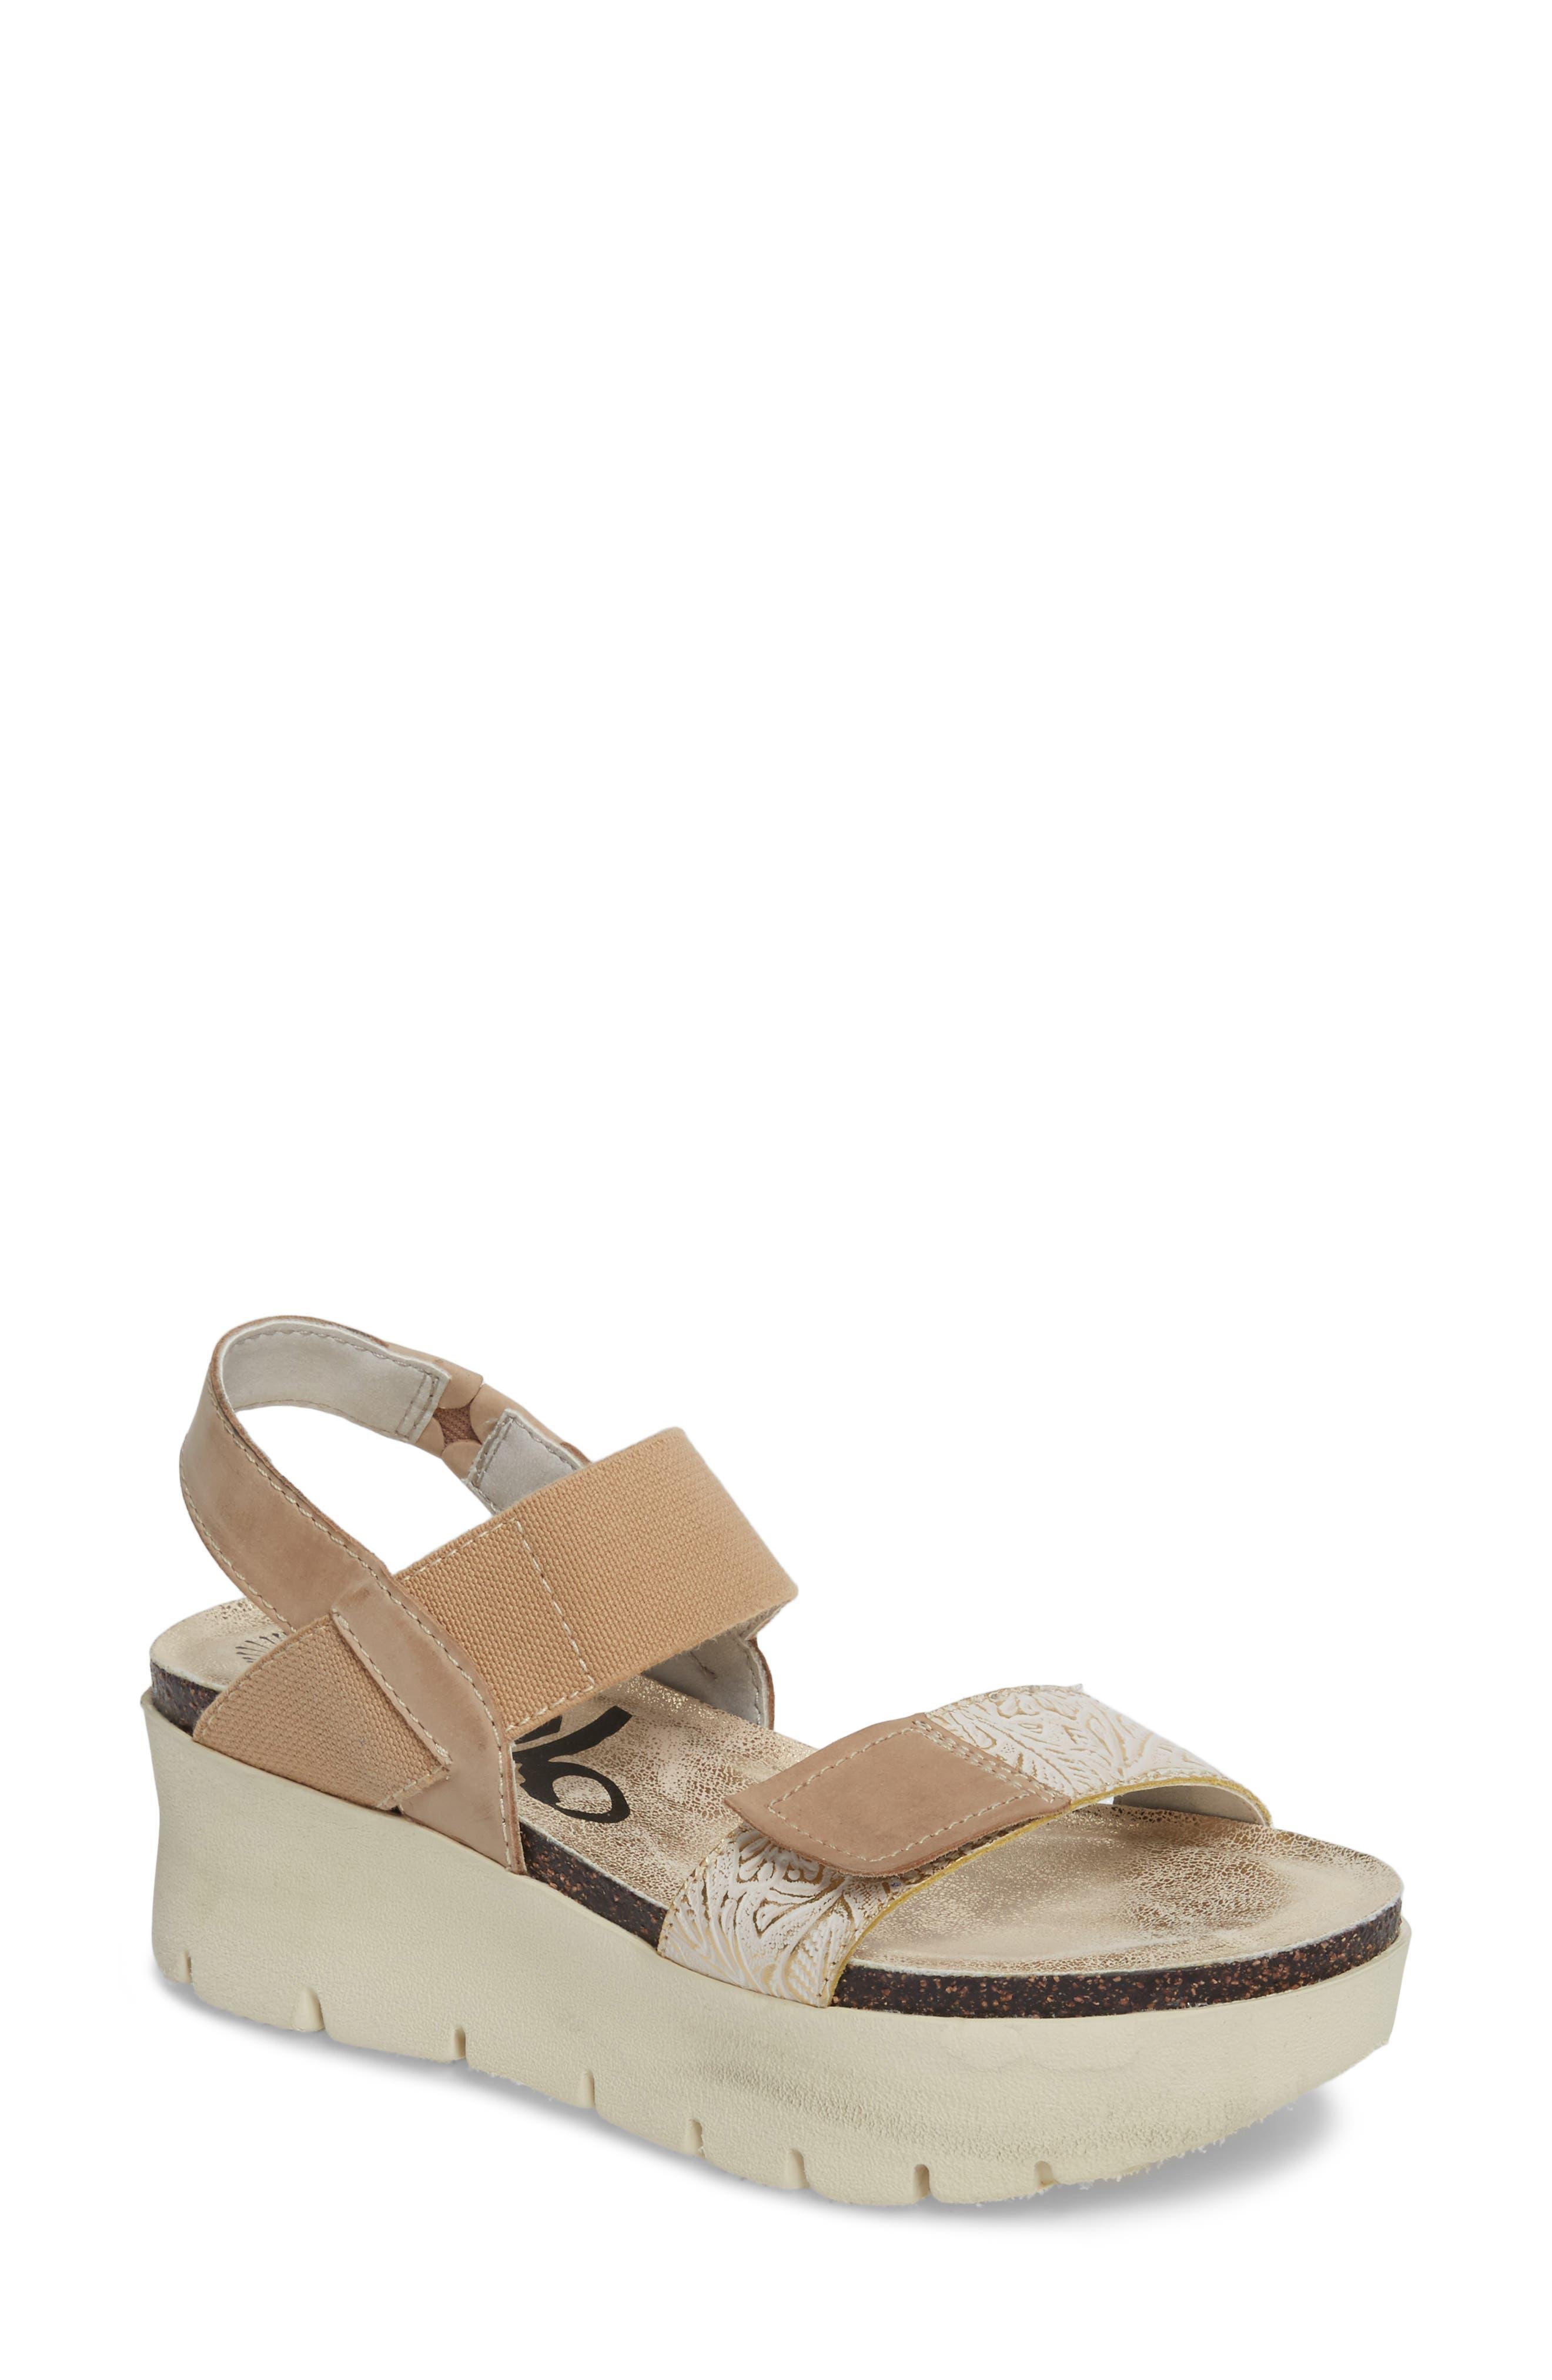 Main Image - OTBT Nova Platform Sandal (Women)